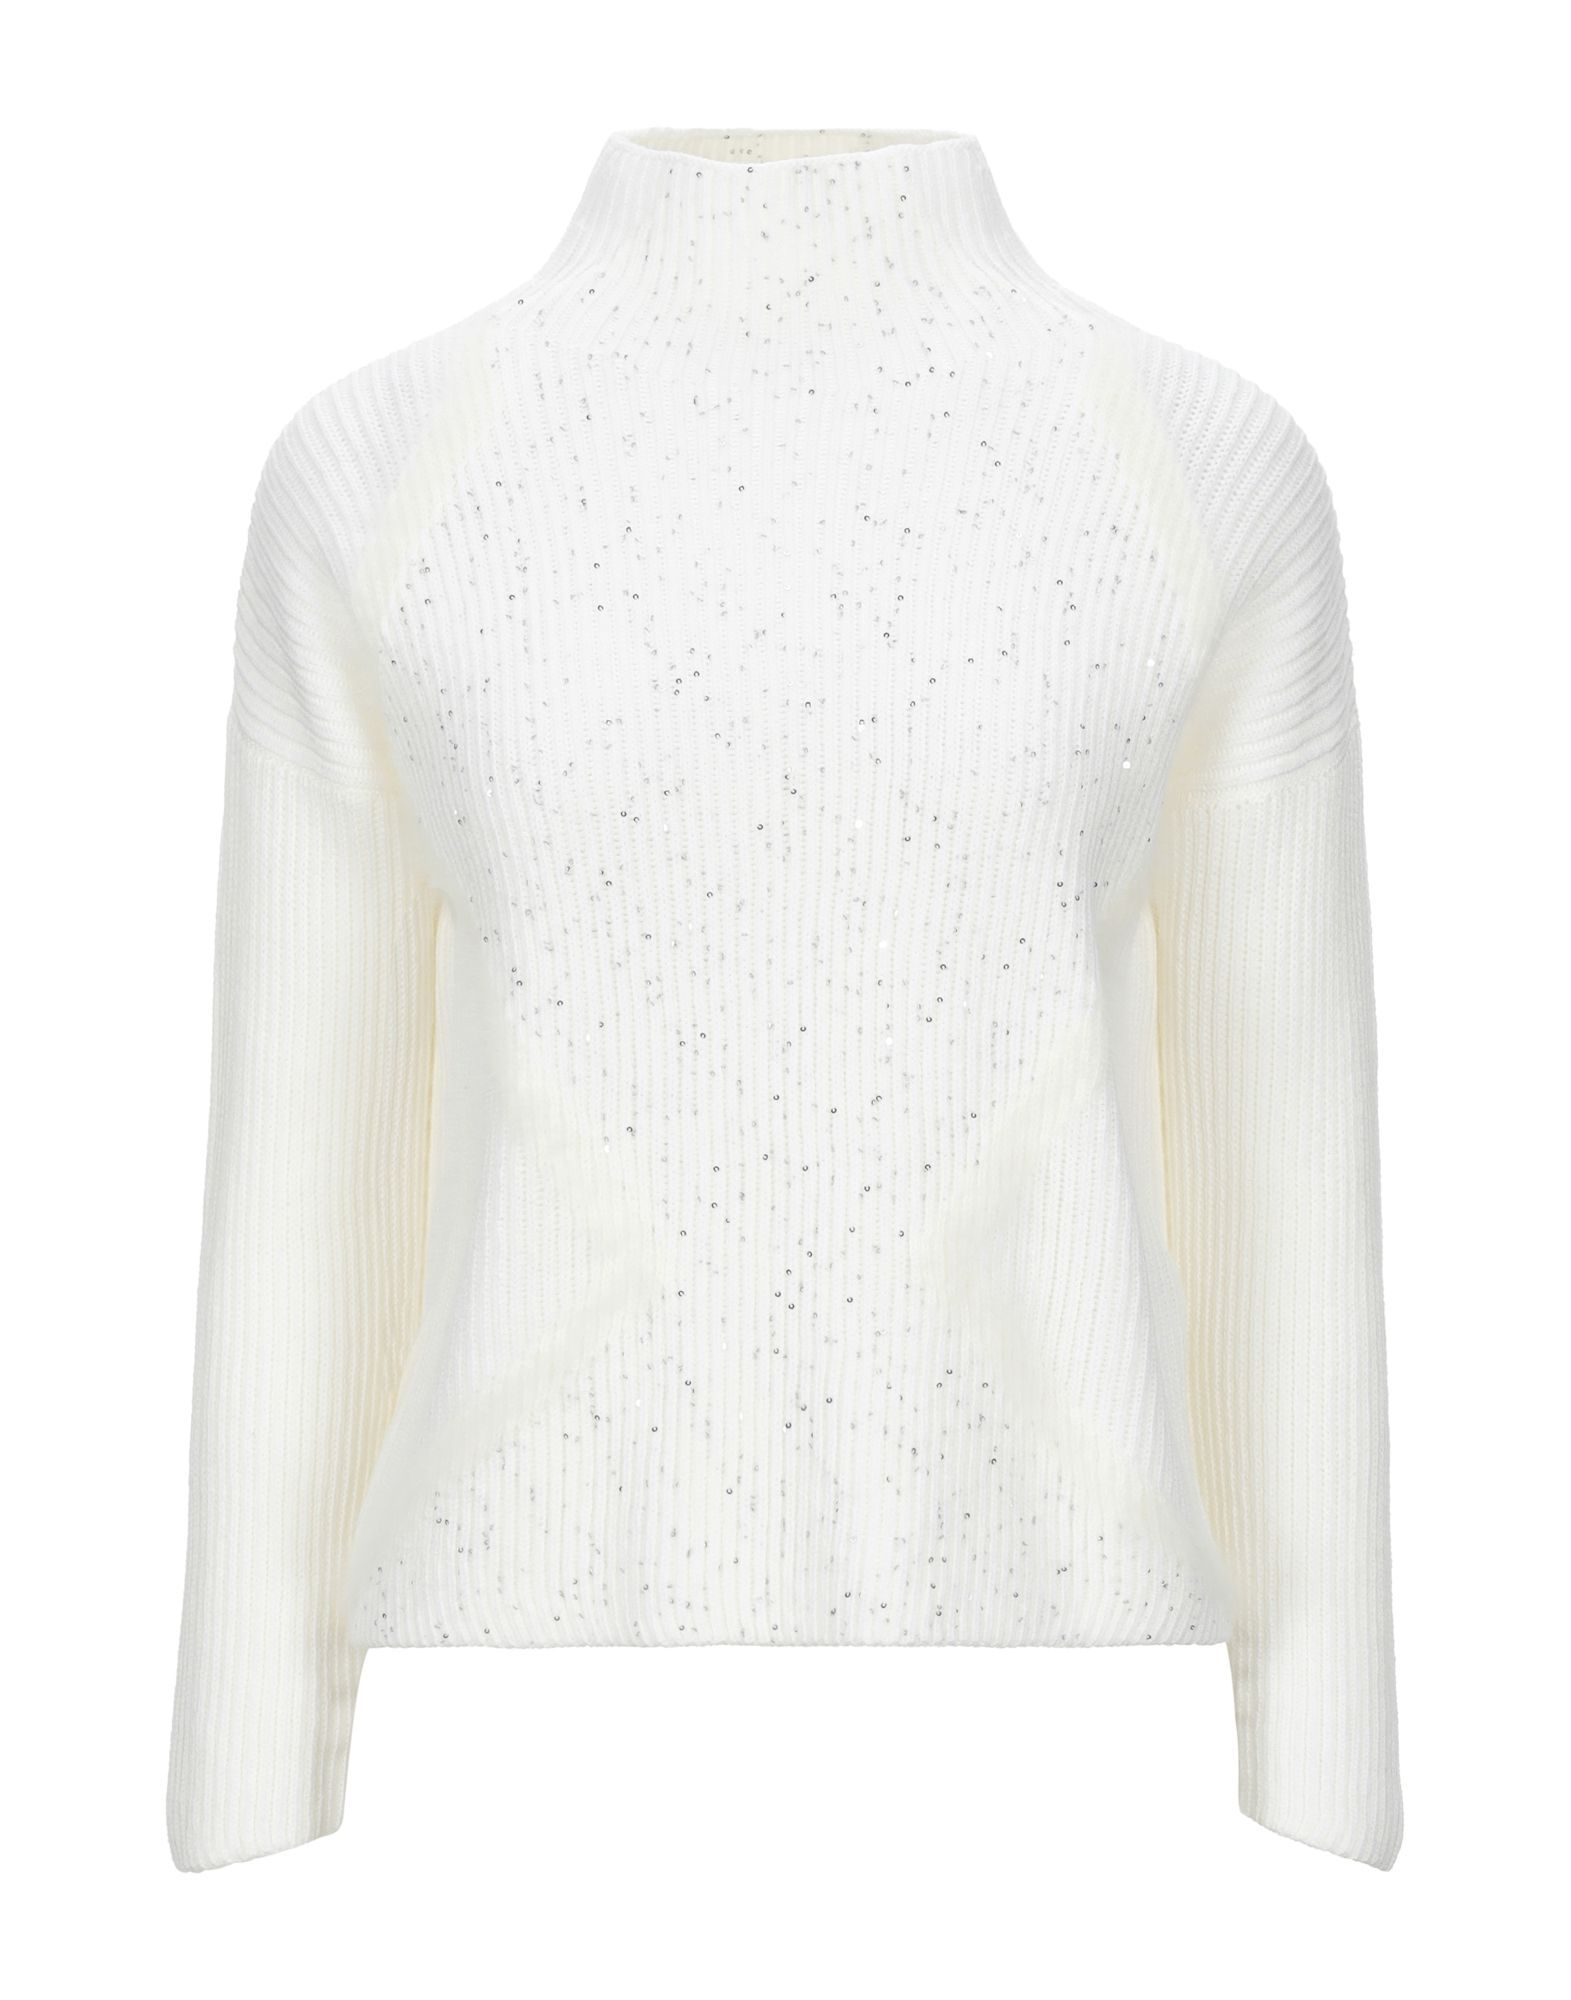 KNITWEAR Lorena Antoniazzi White Woman Virgin Wool